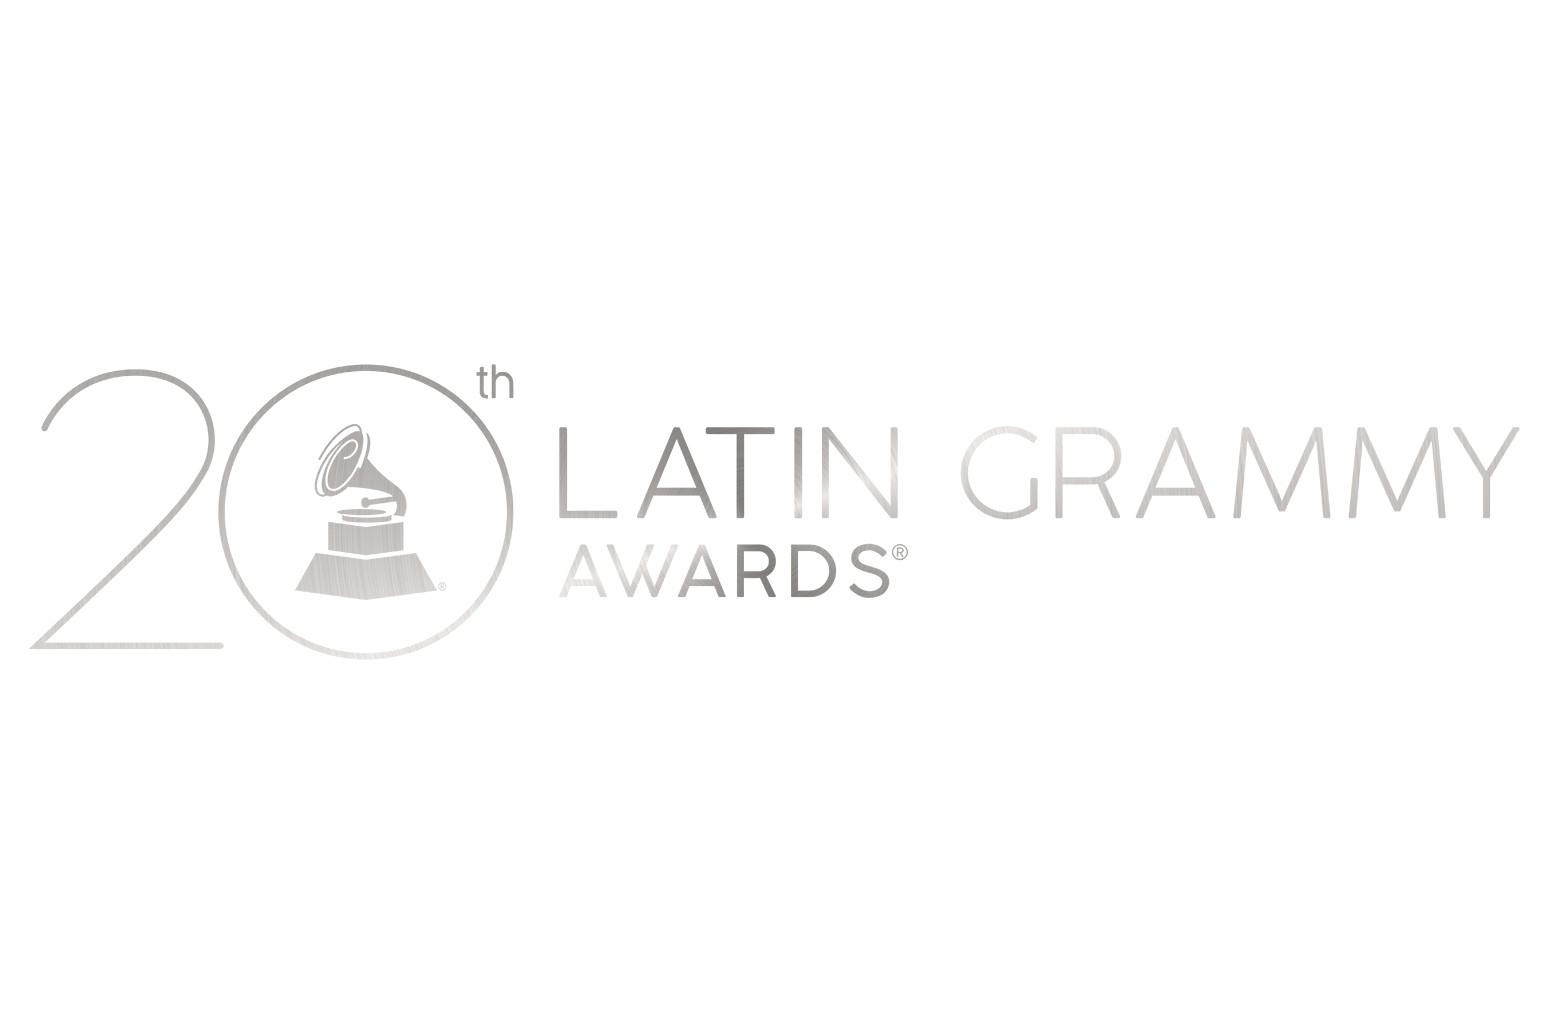 latin recording academy reveals new logo plus more latin grammy details billboard latin recording academy reveals new